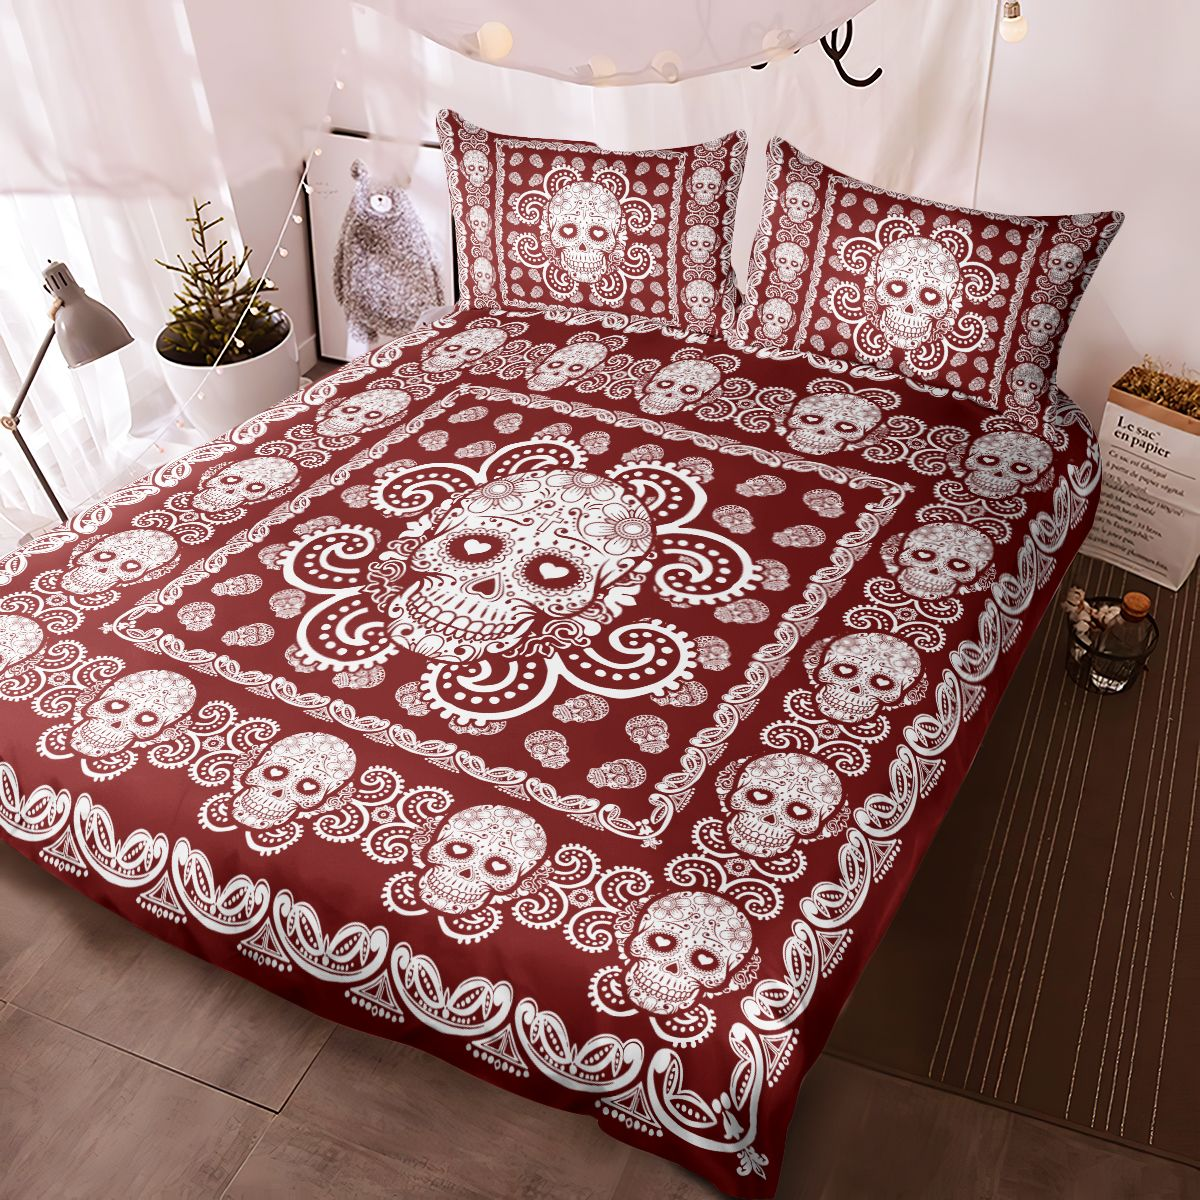 Sugar Skull Red and White Pattern Premium Bedding Set